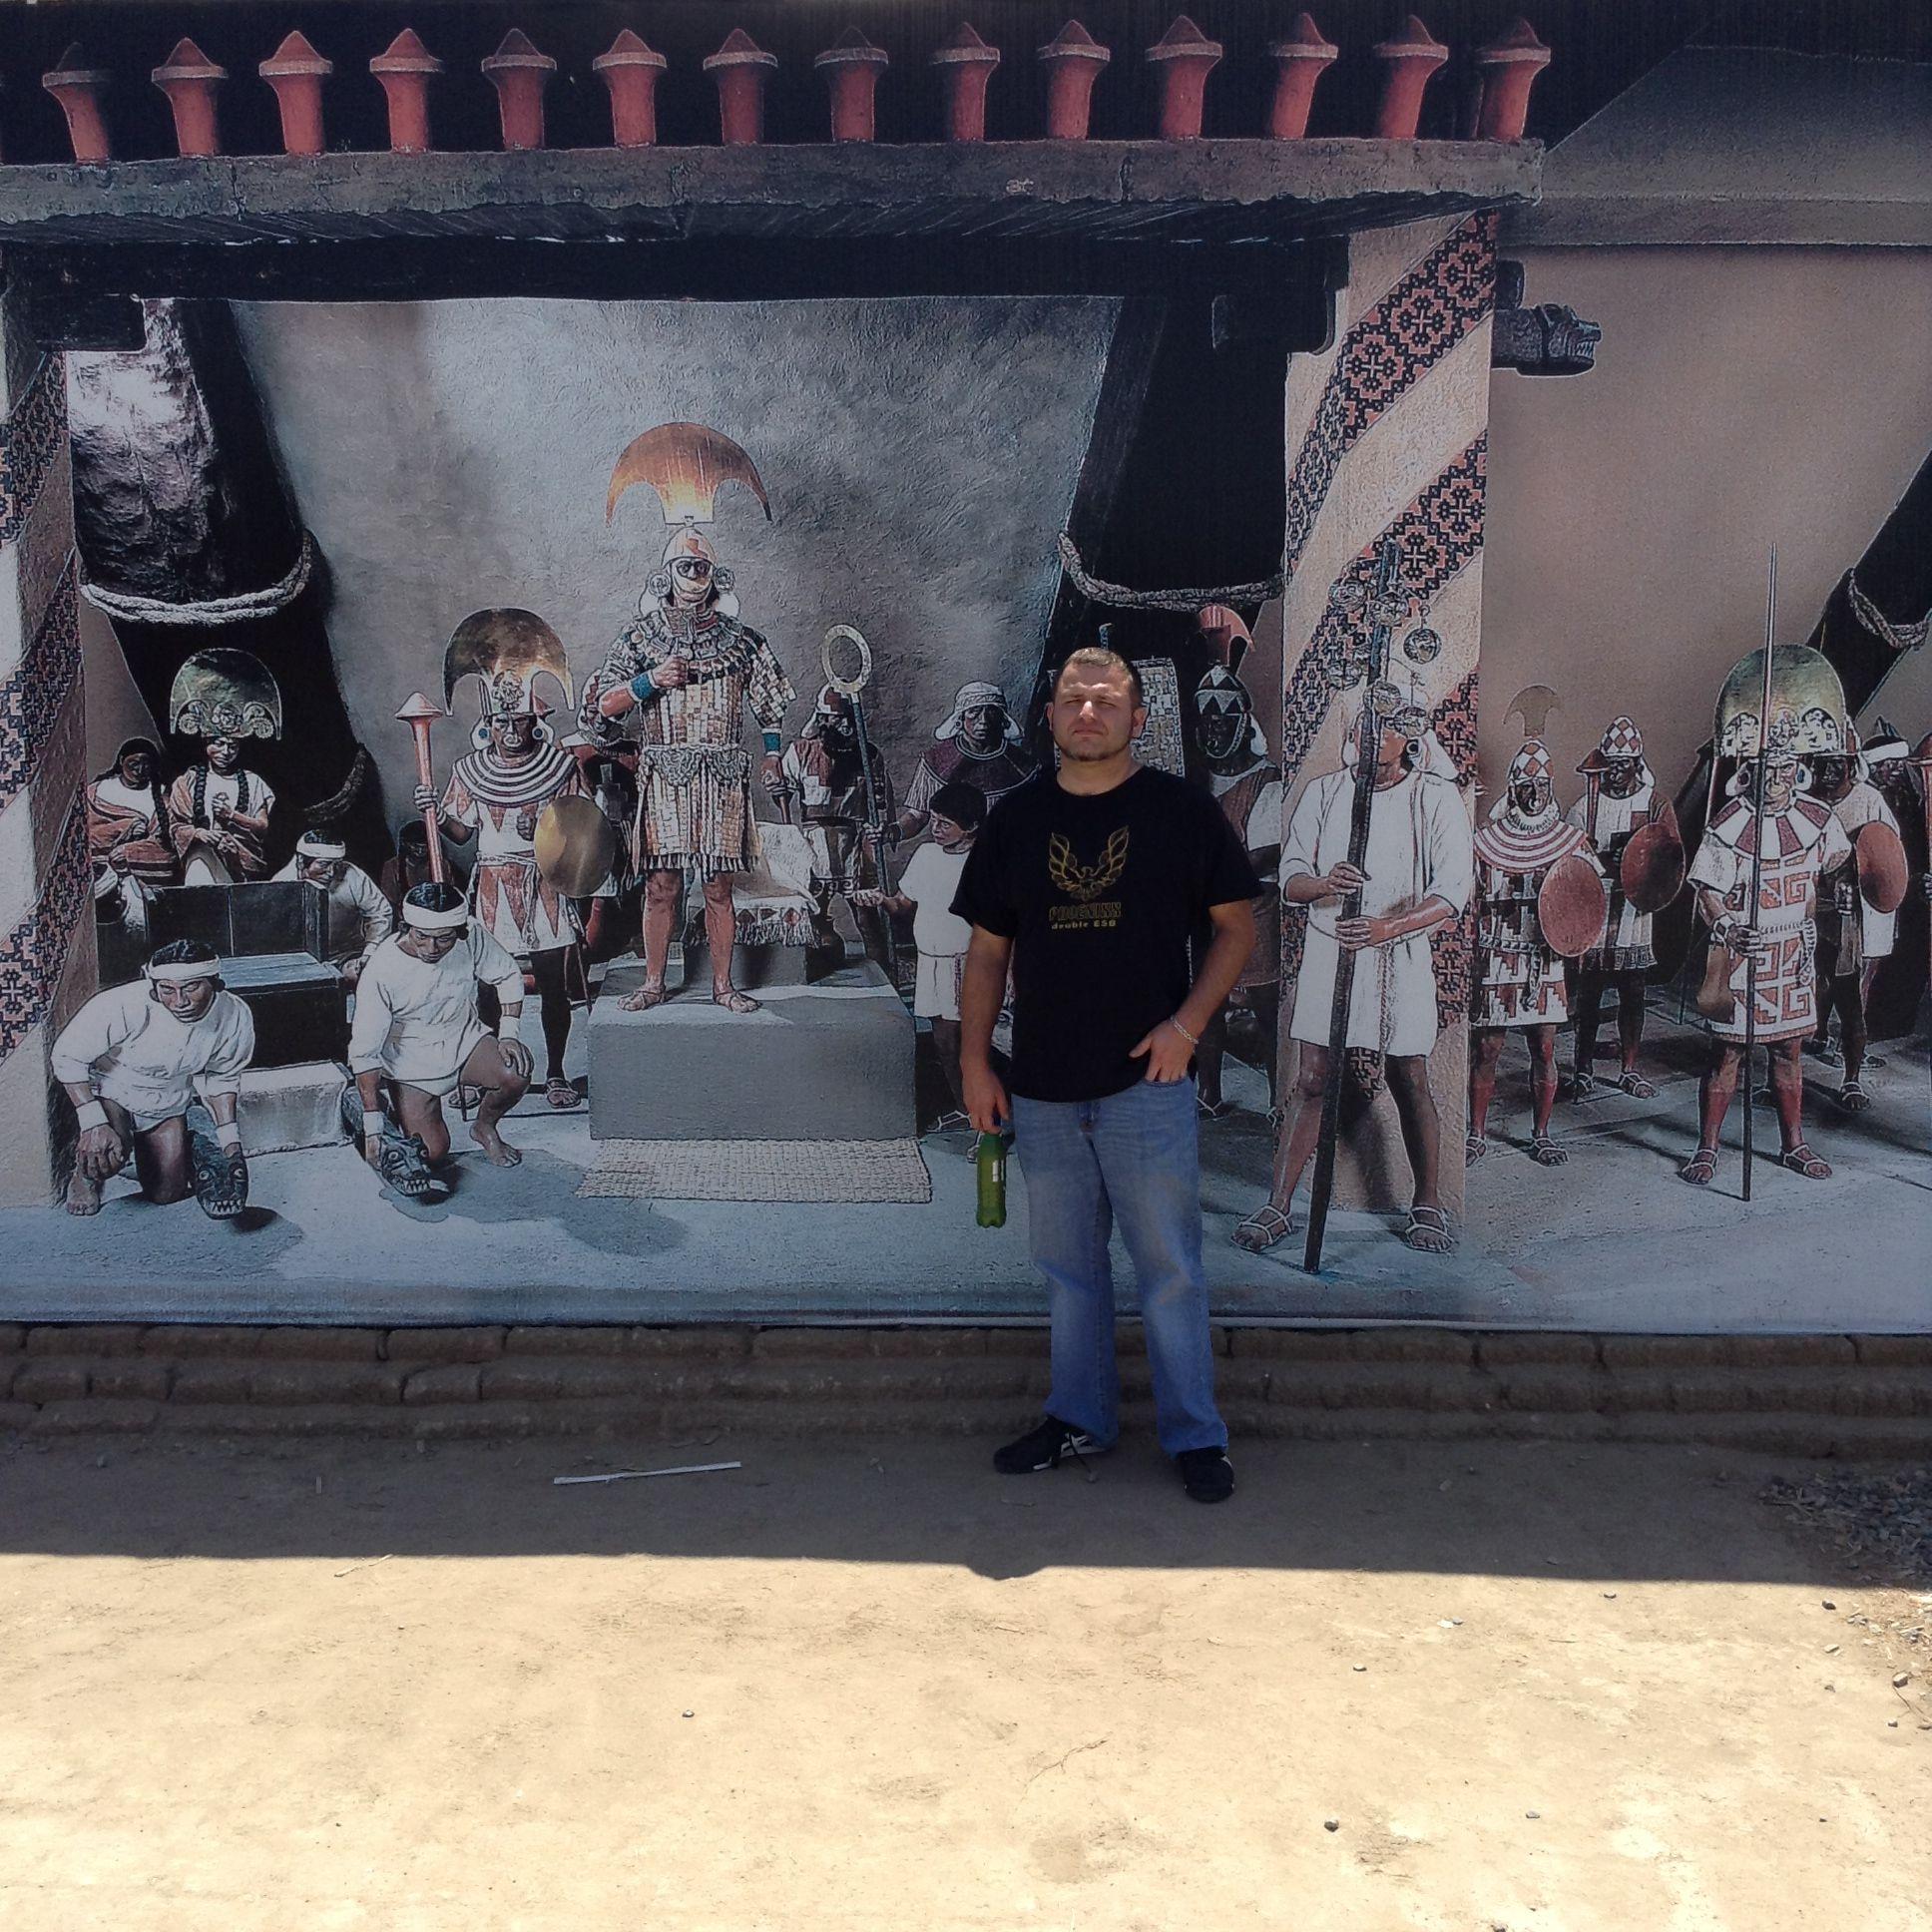 Cool mural at the museum in Tucume, Peru...